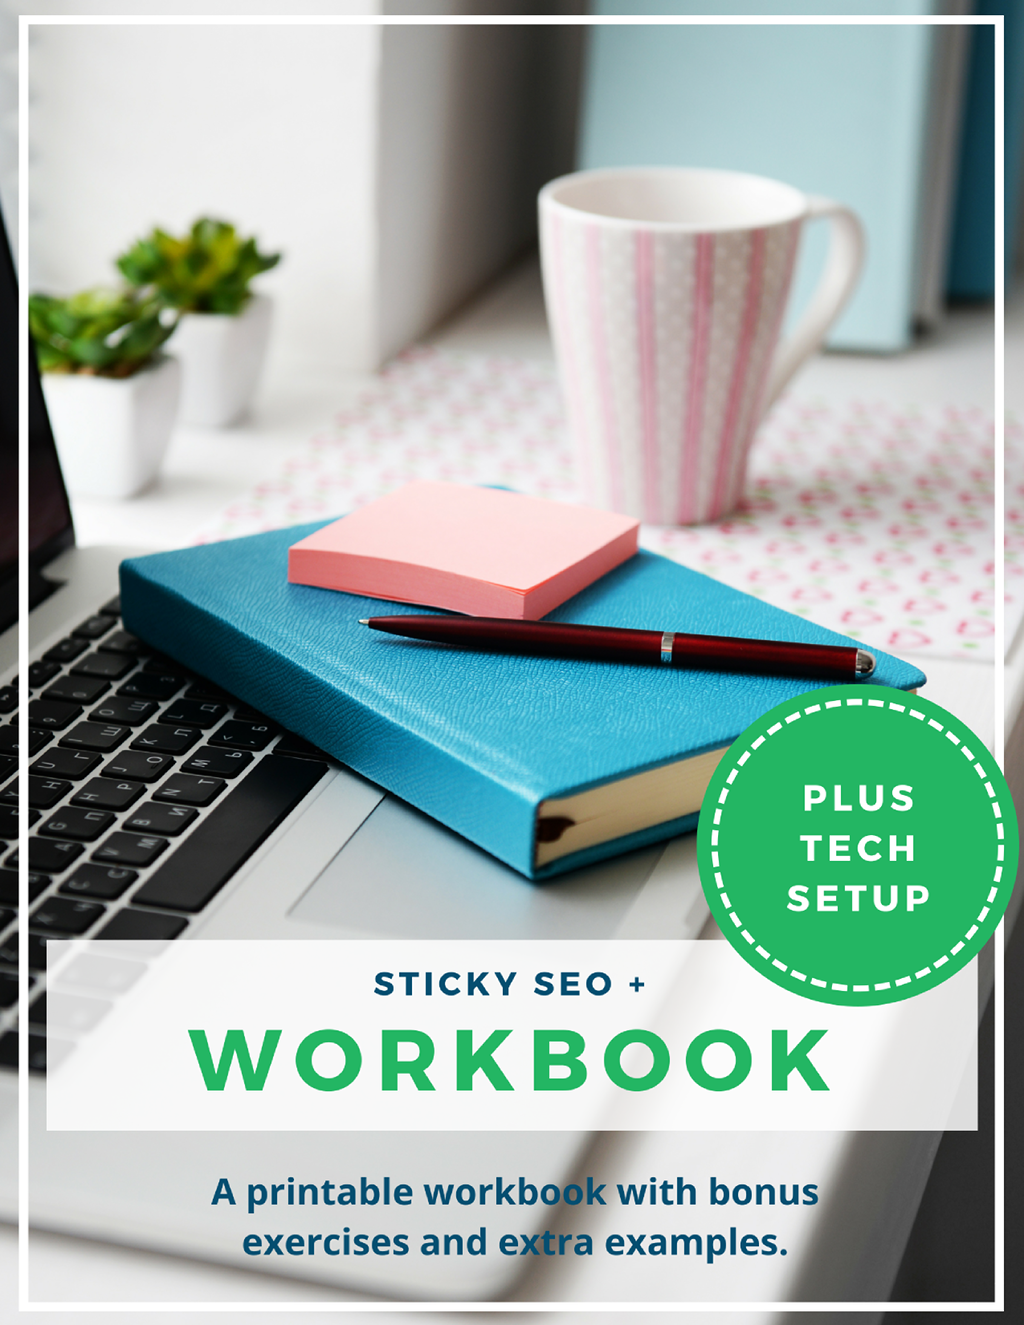 Sticky SEO + Workbook + Tech Setup